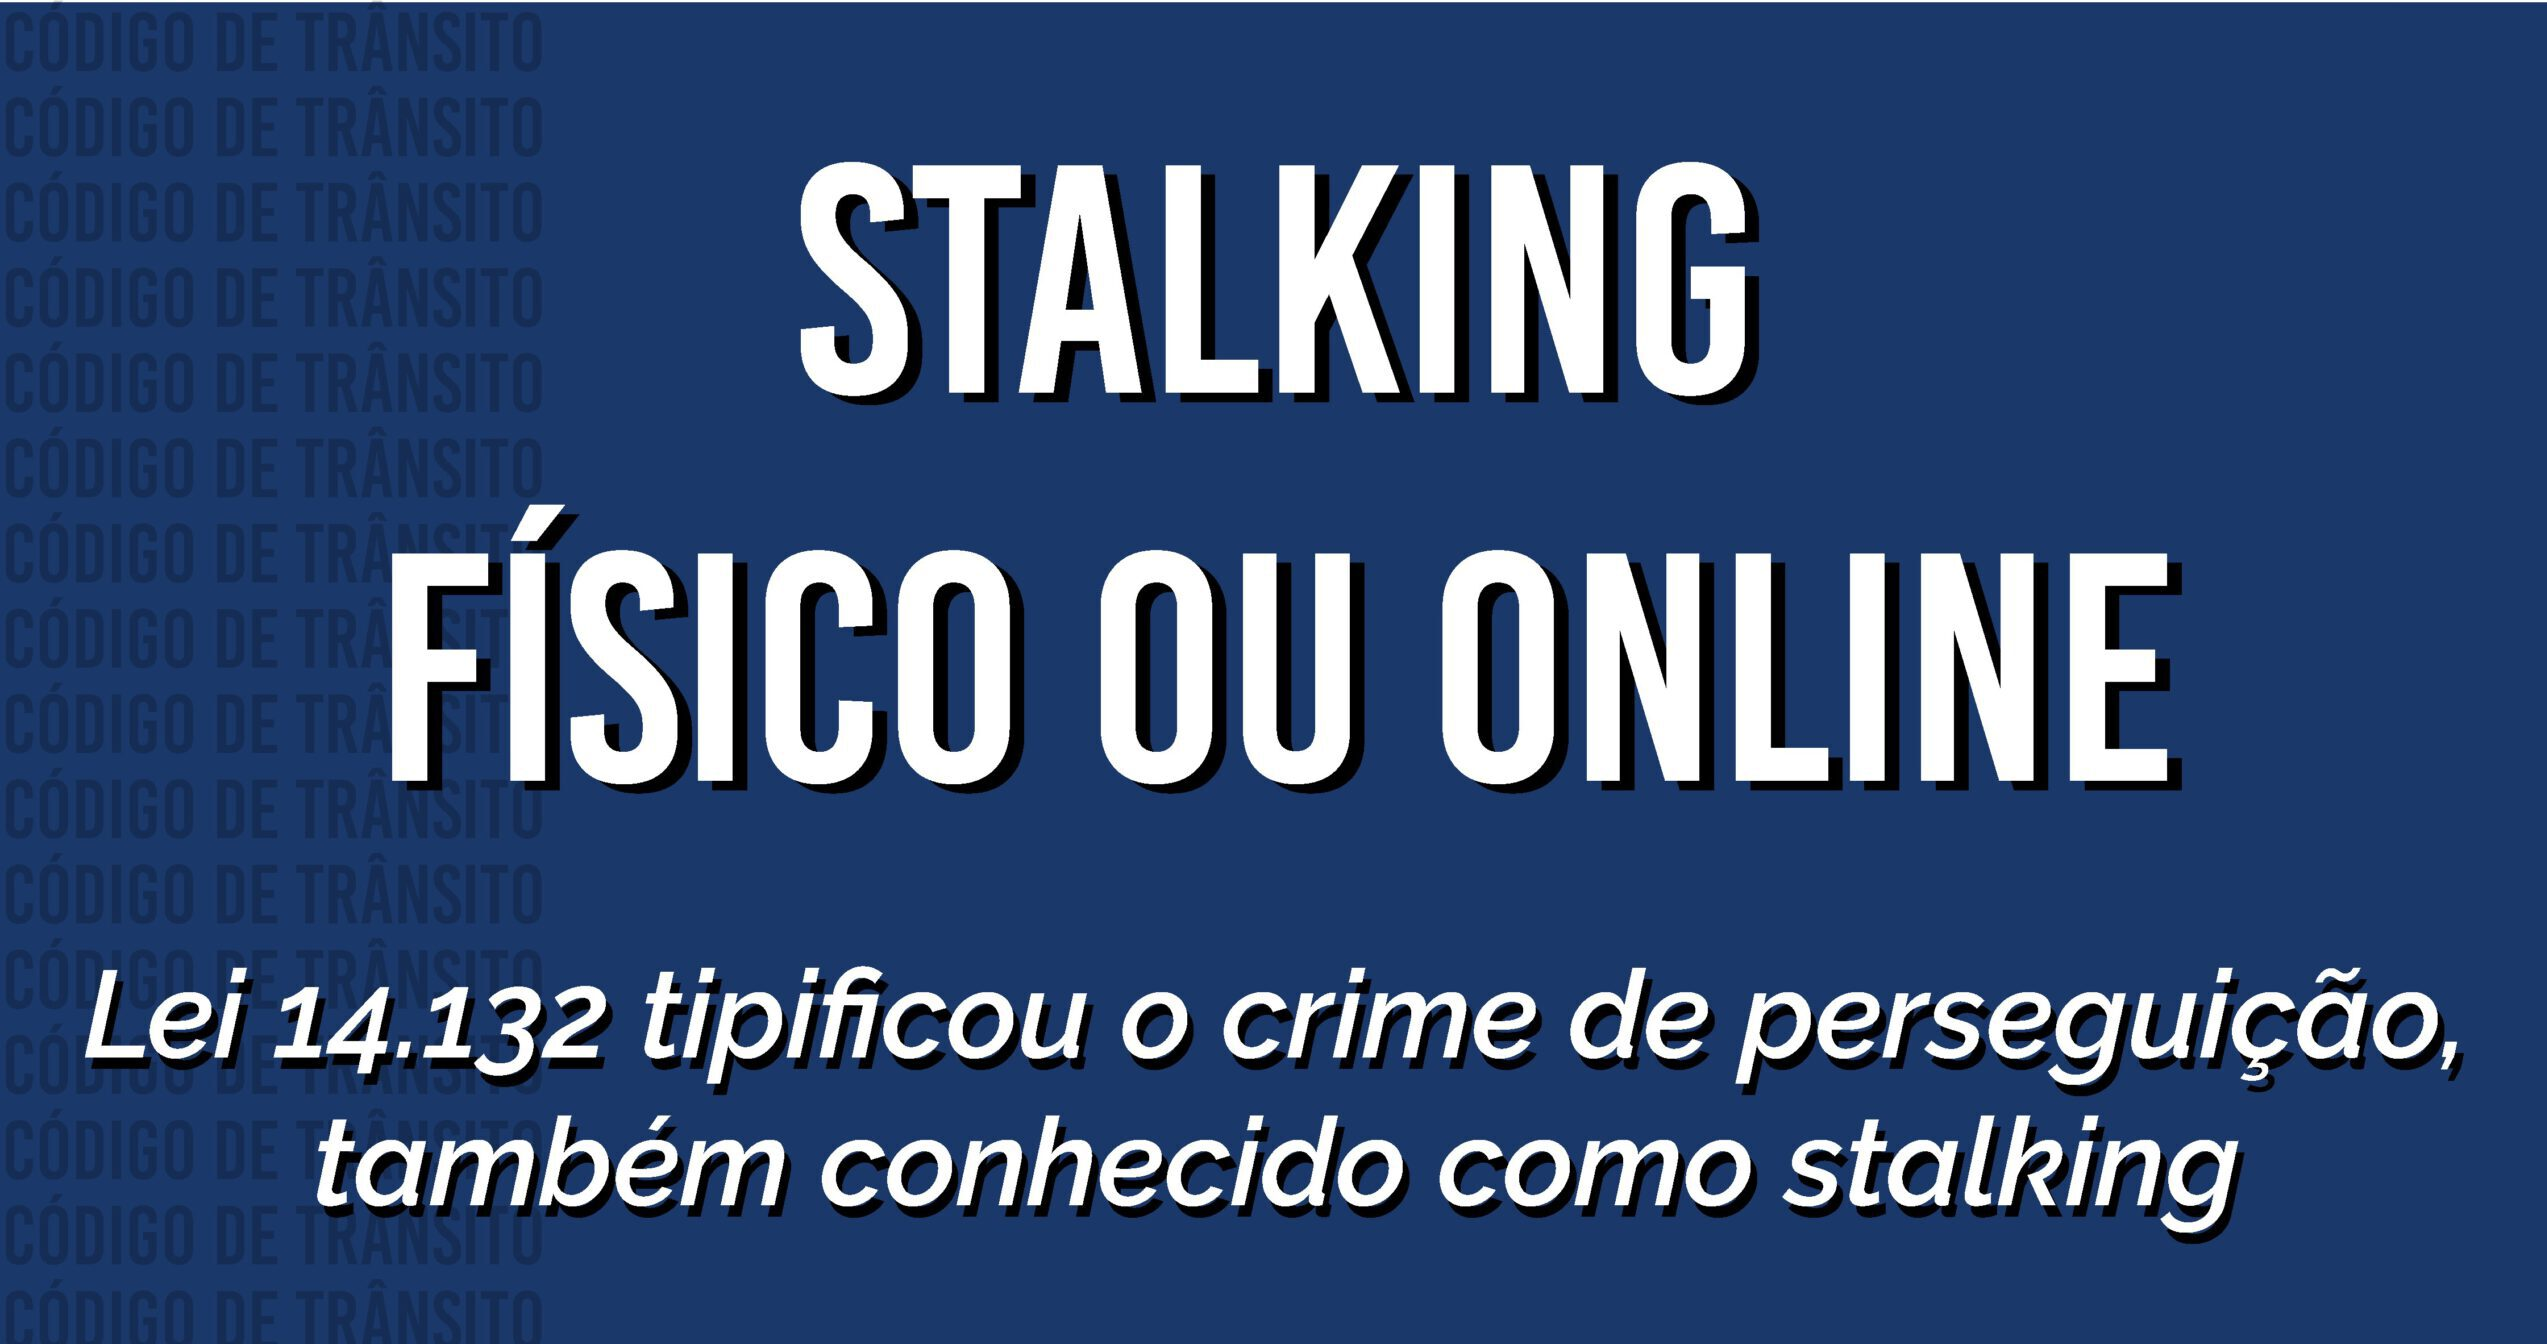 Stalking agora é crime na internet e fora dela